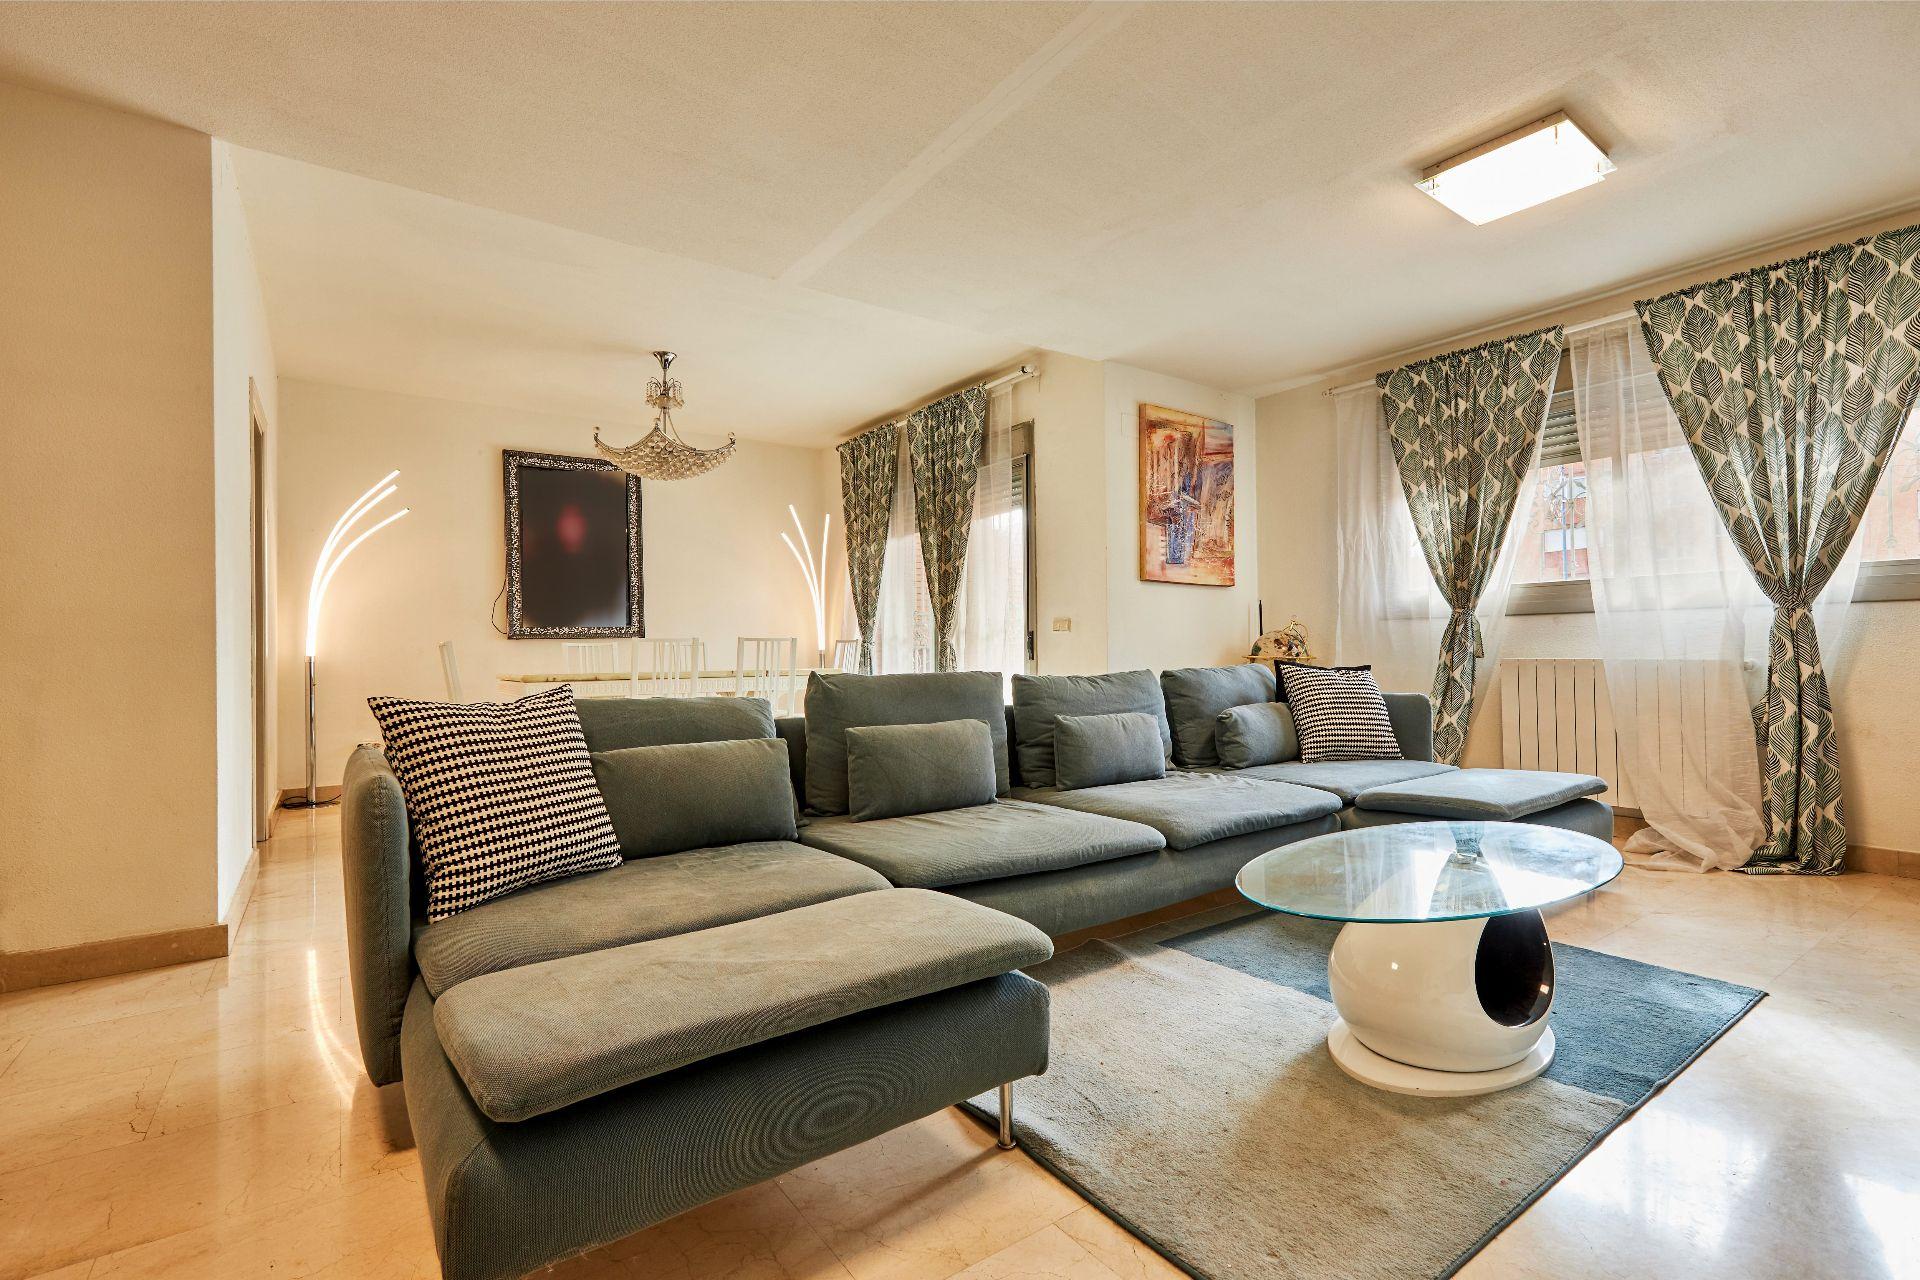 Casa / Chalet en Madrid, zona A-42, venta